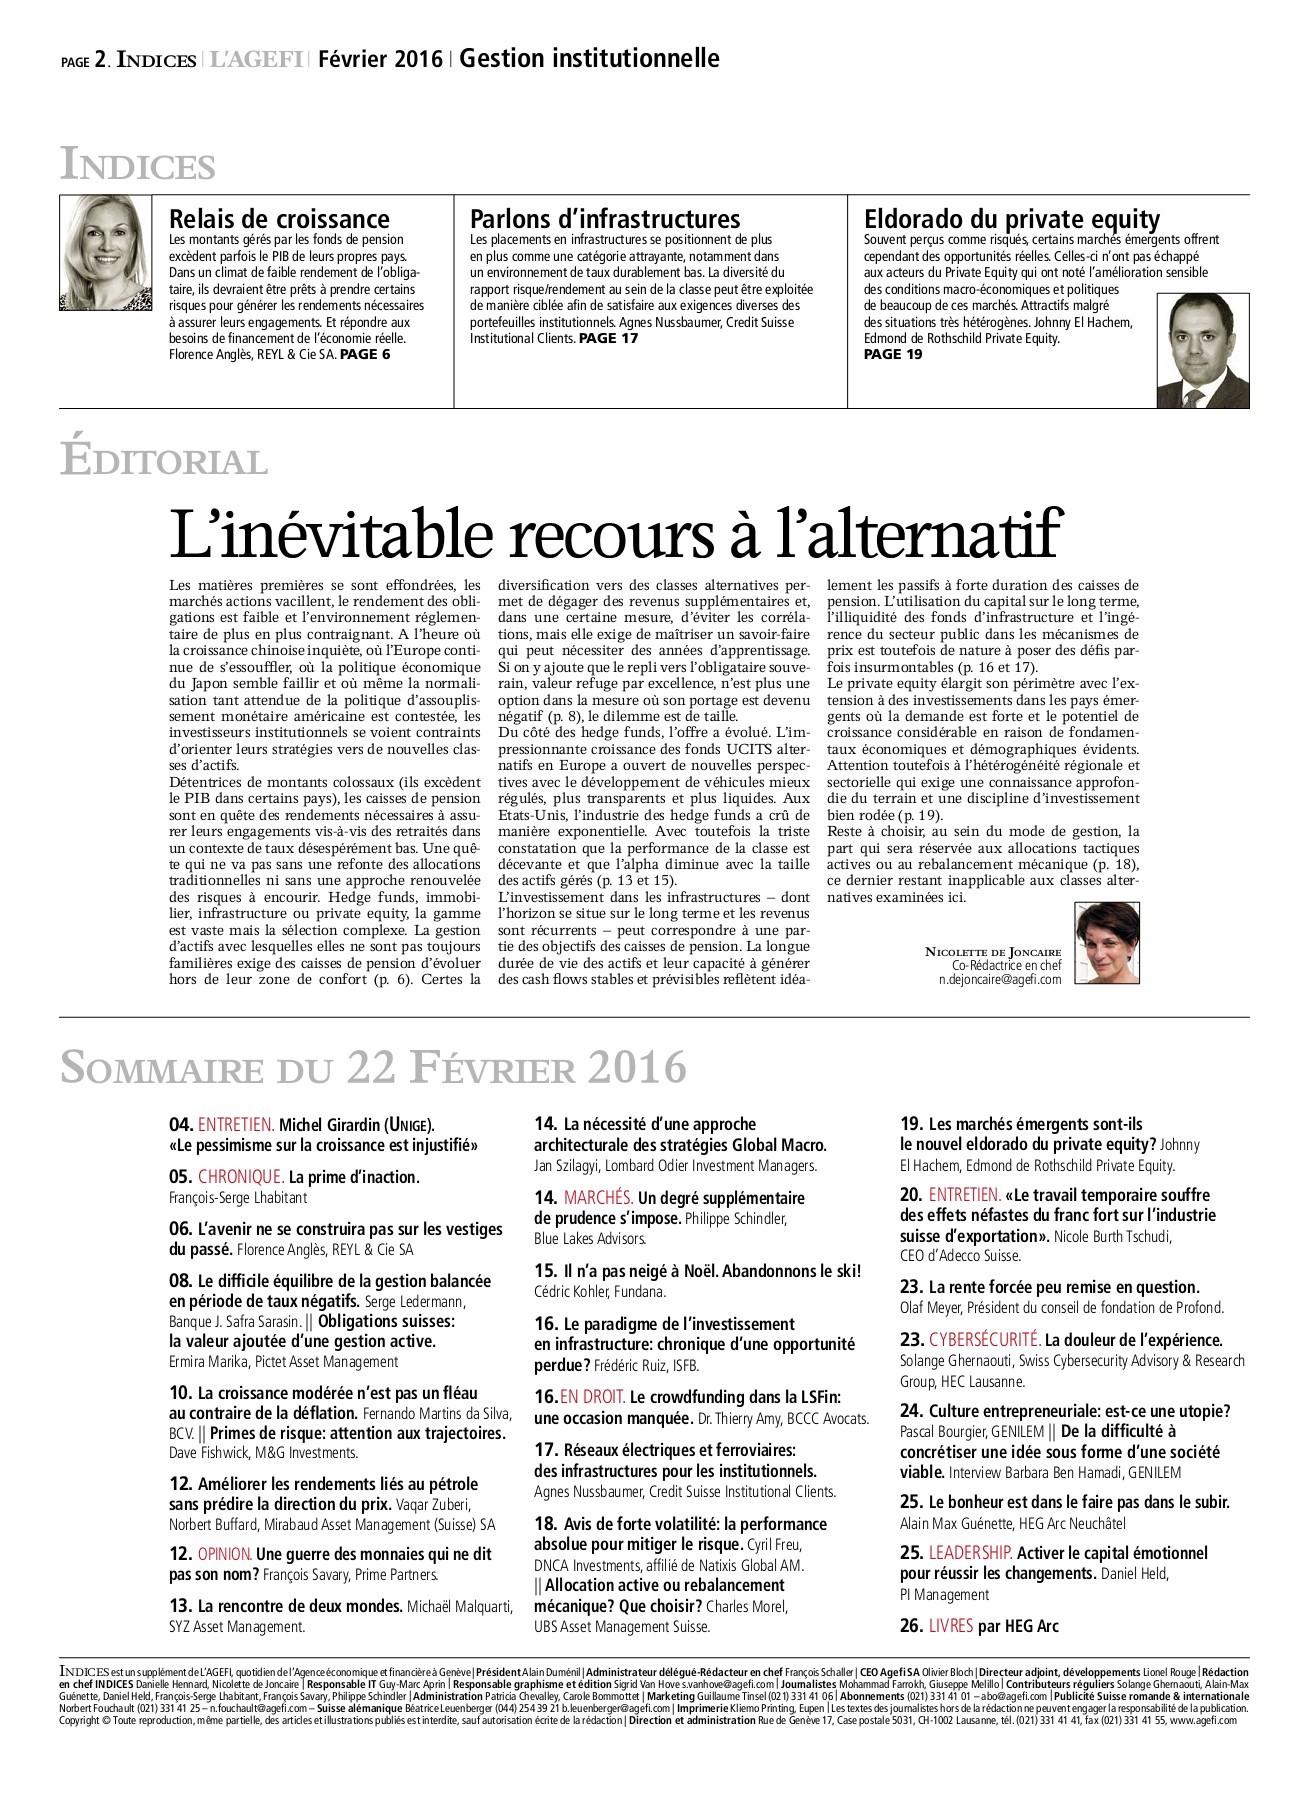 Guide Des Bonnes Manieres Rothschild n° 02 2016 indices - gestion institutionnelle pages 1 - 28